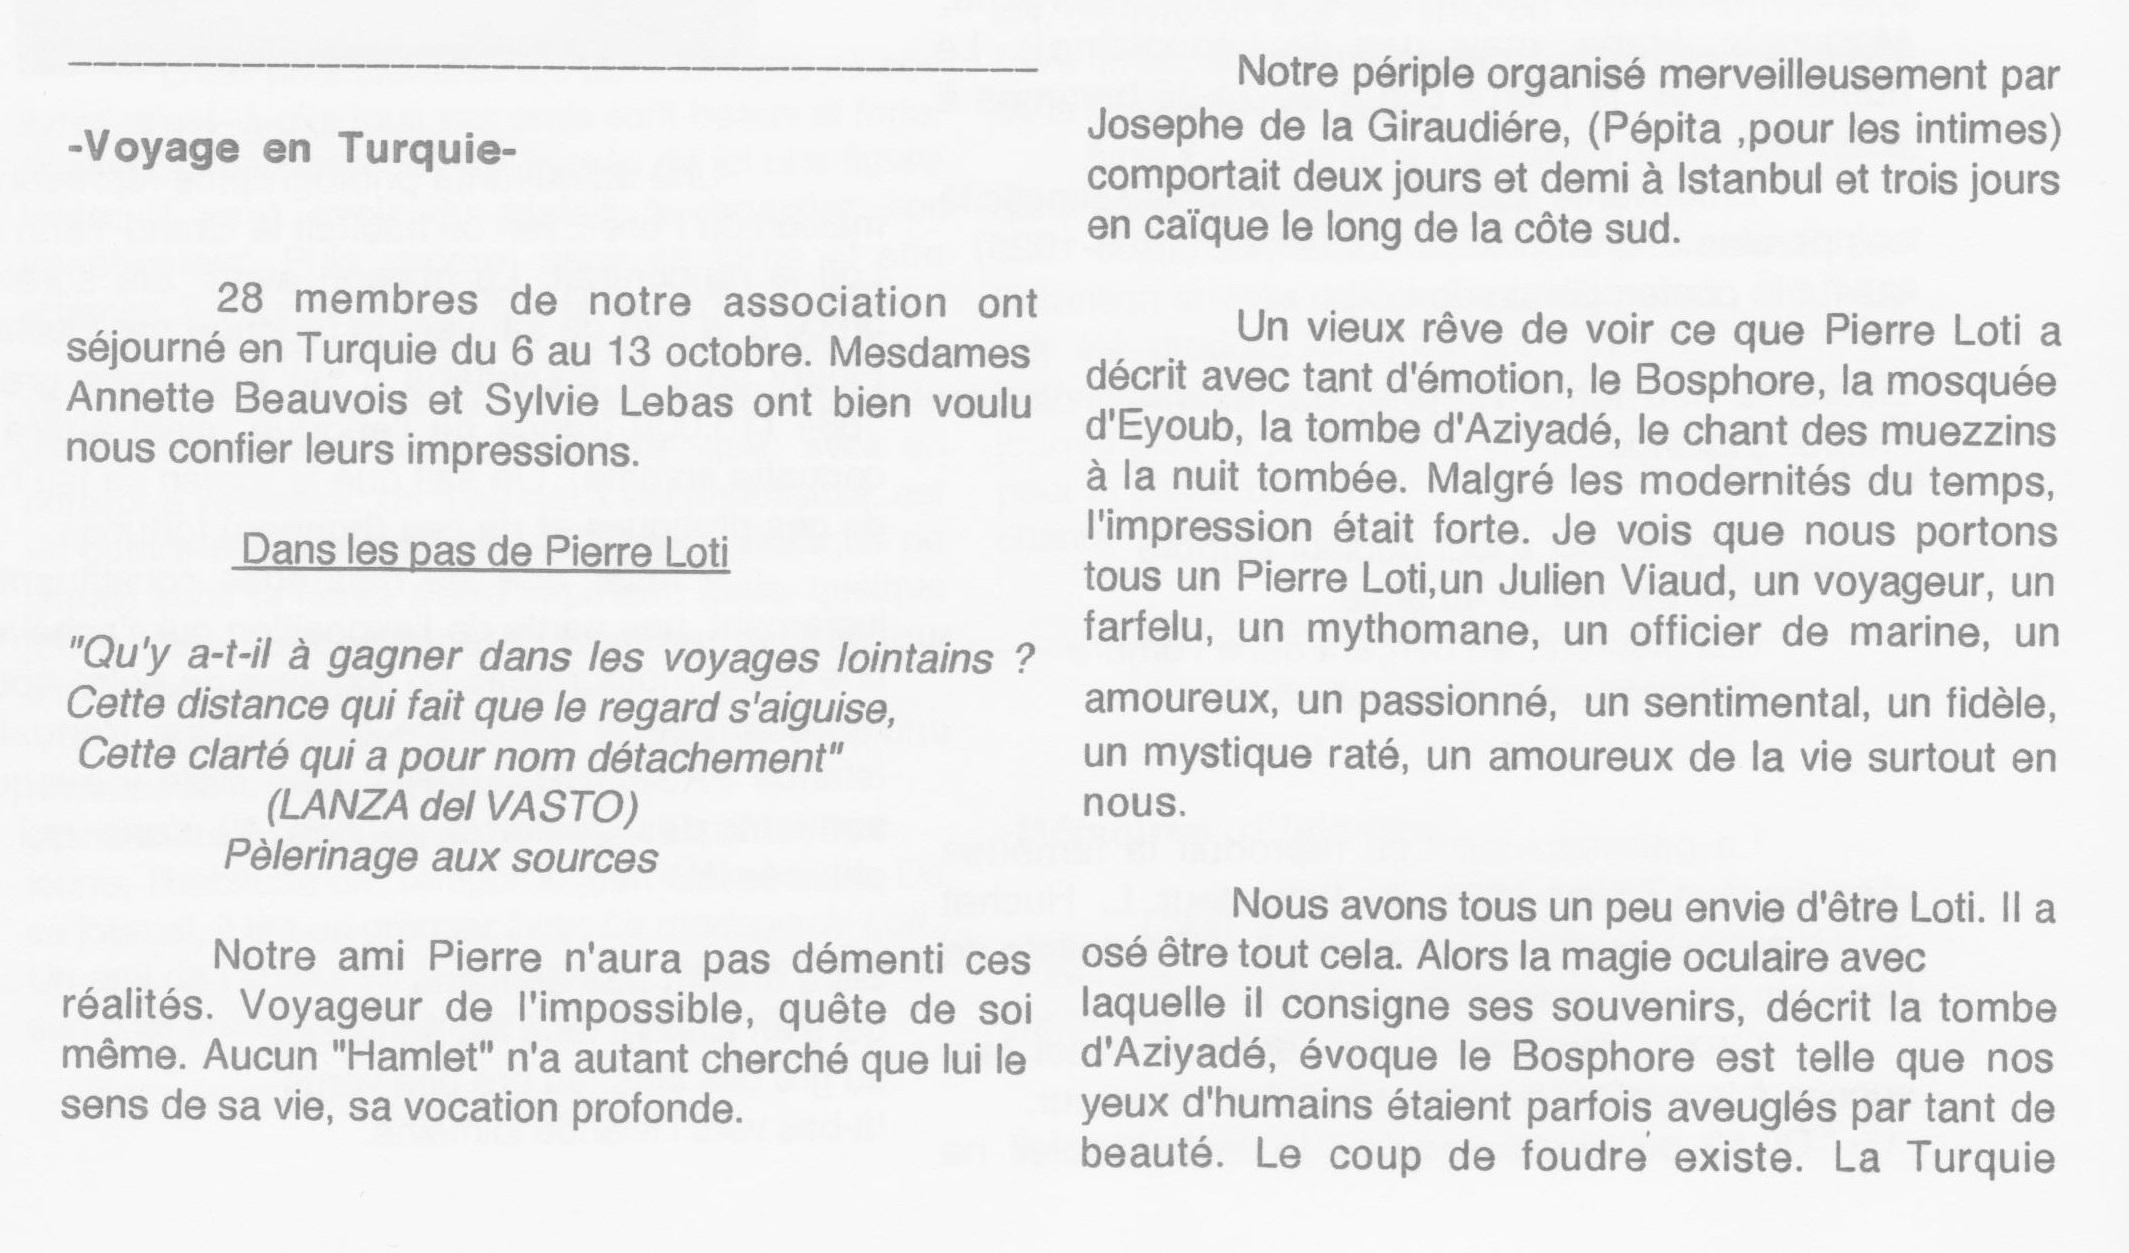 Voyage en Turquie-du 6 au 13 octobre 2000-page1a